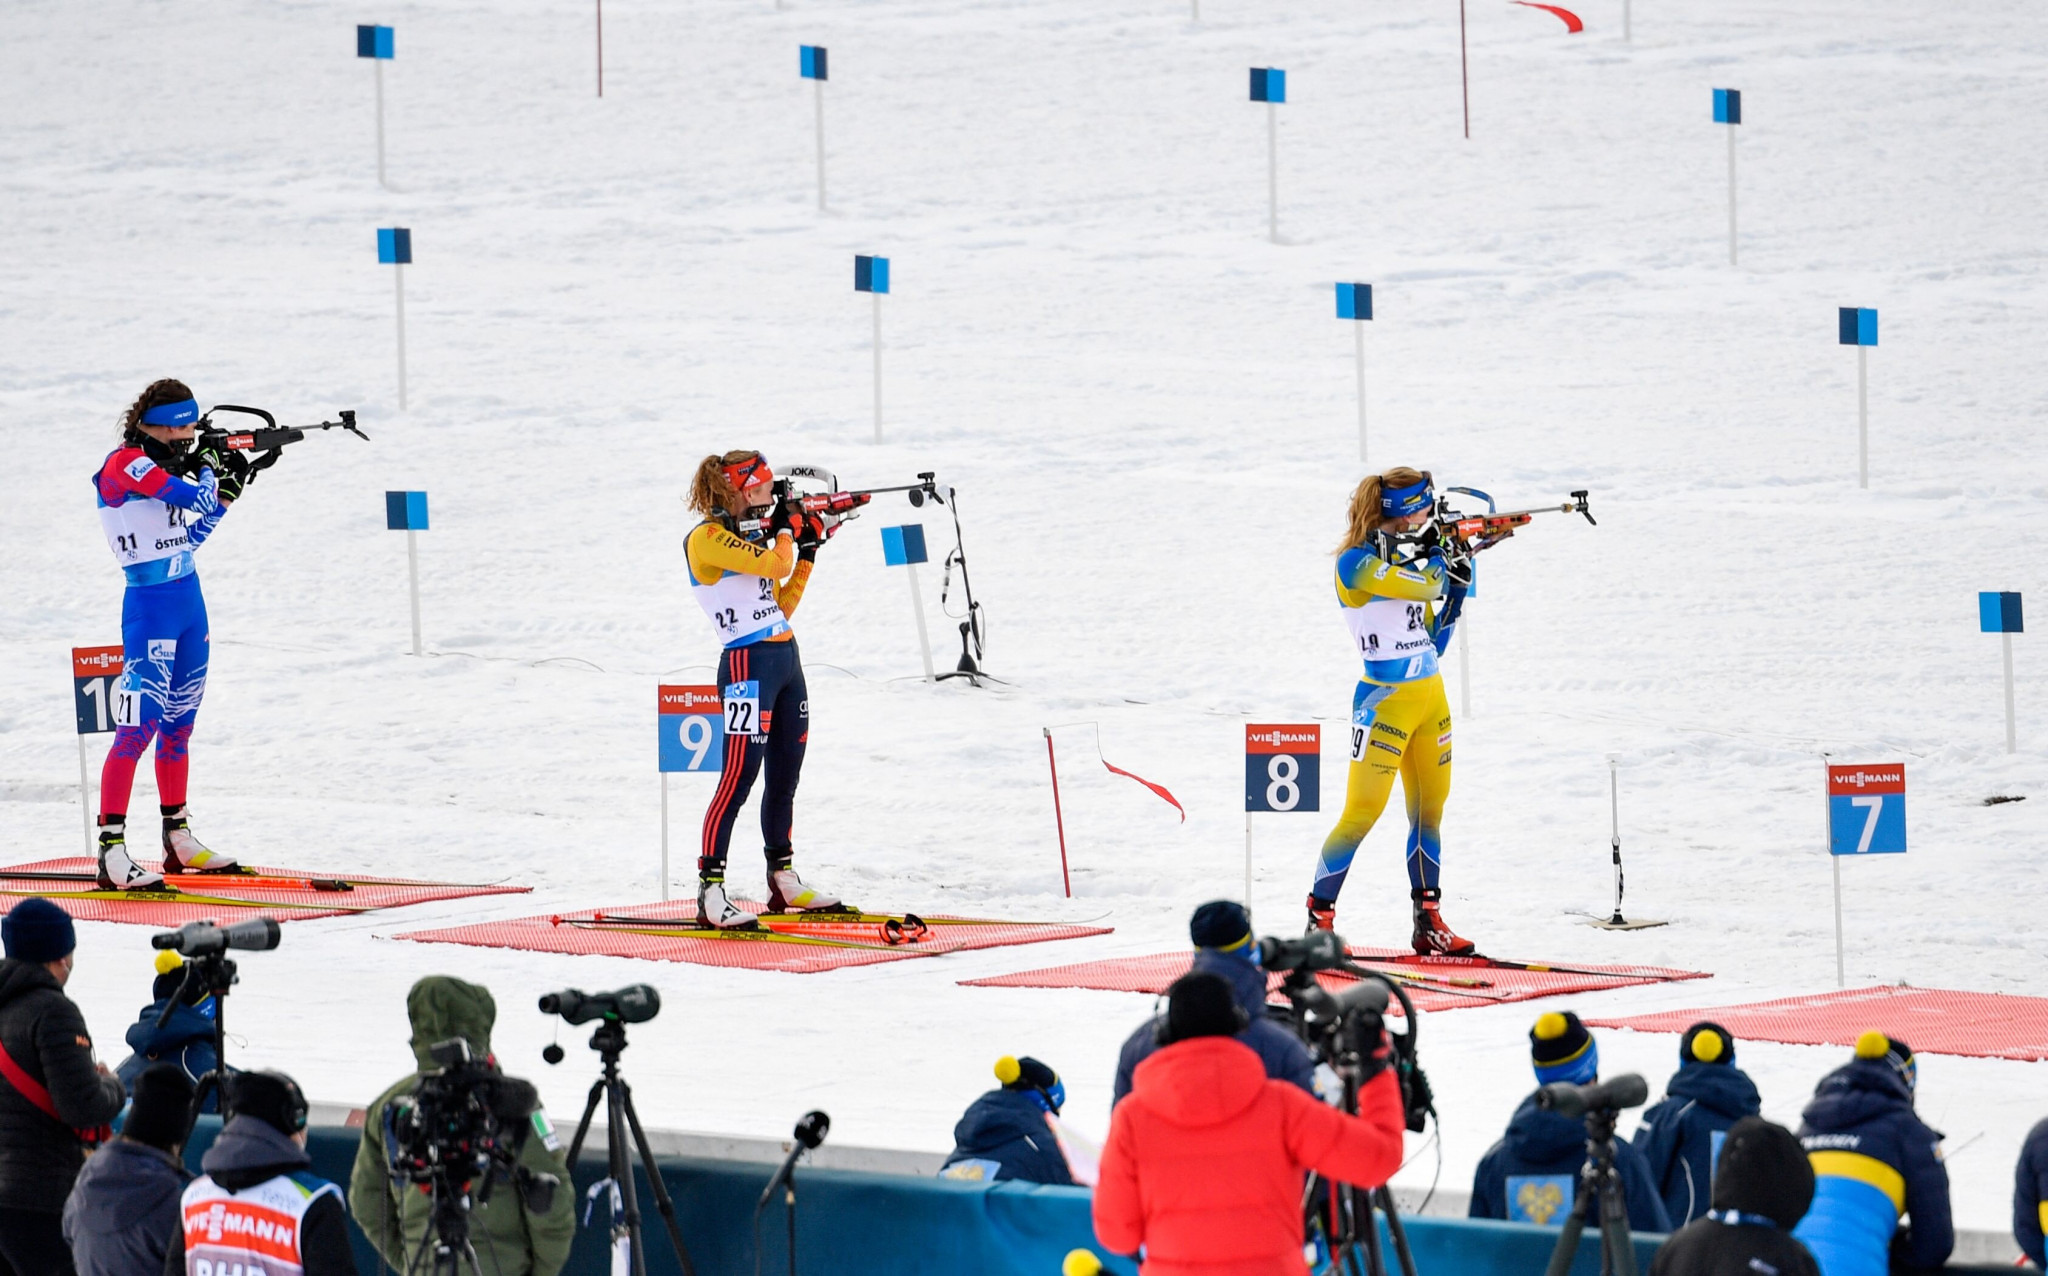 Russian biathlete Sidorova seeking to gain Ukrainian citizenship before Lucerne 2021